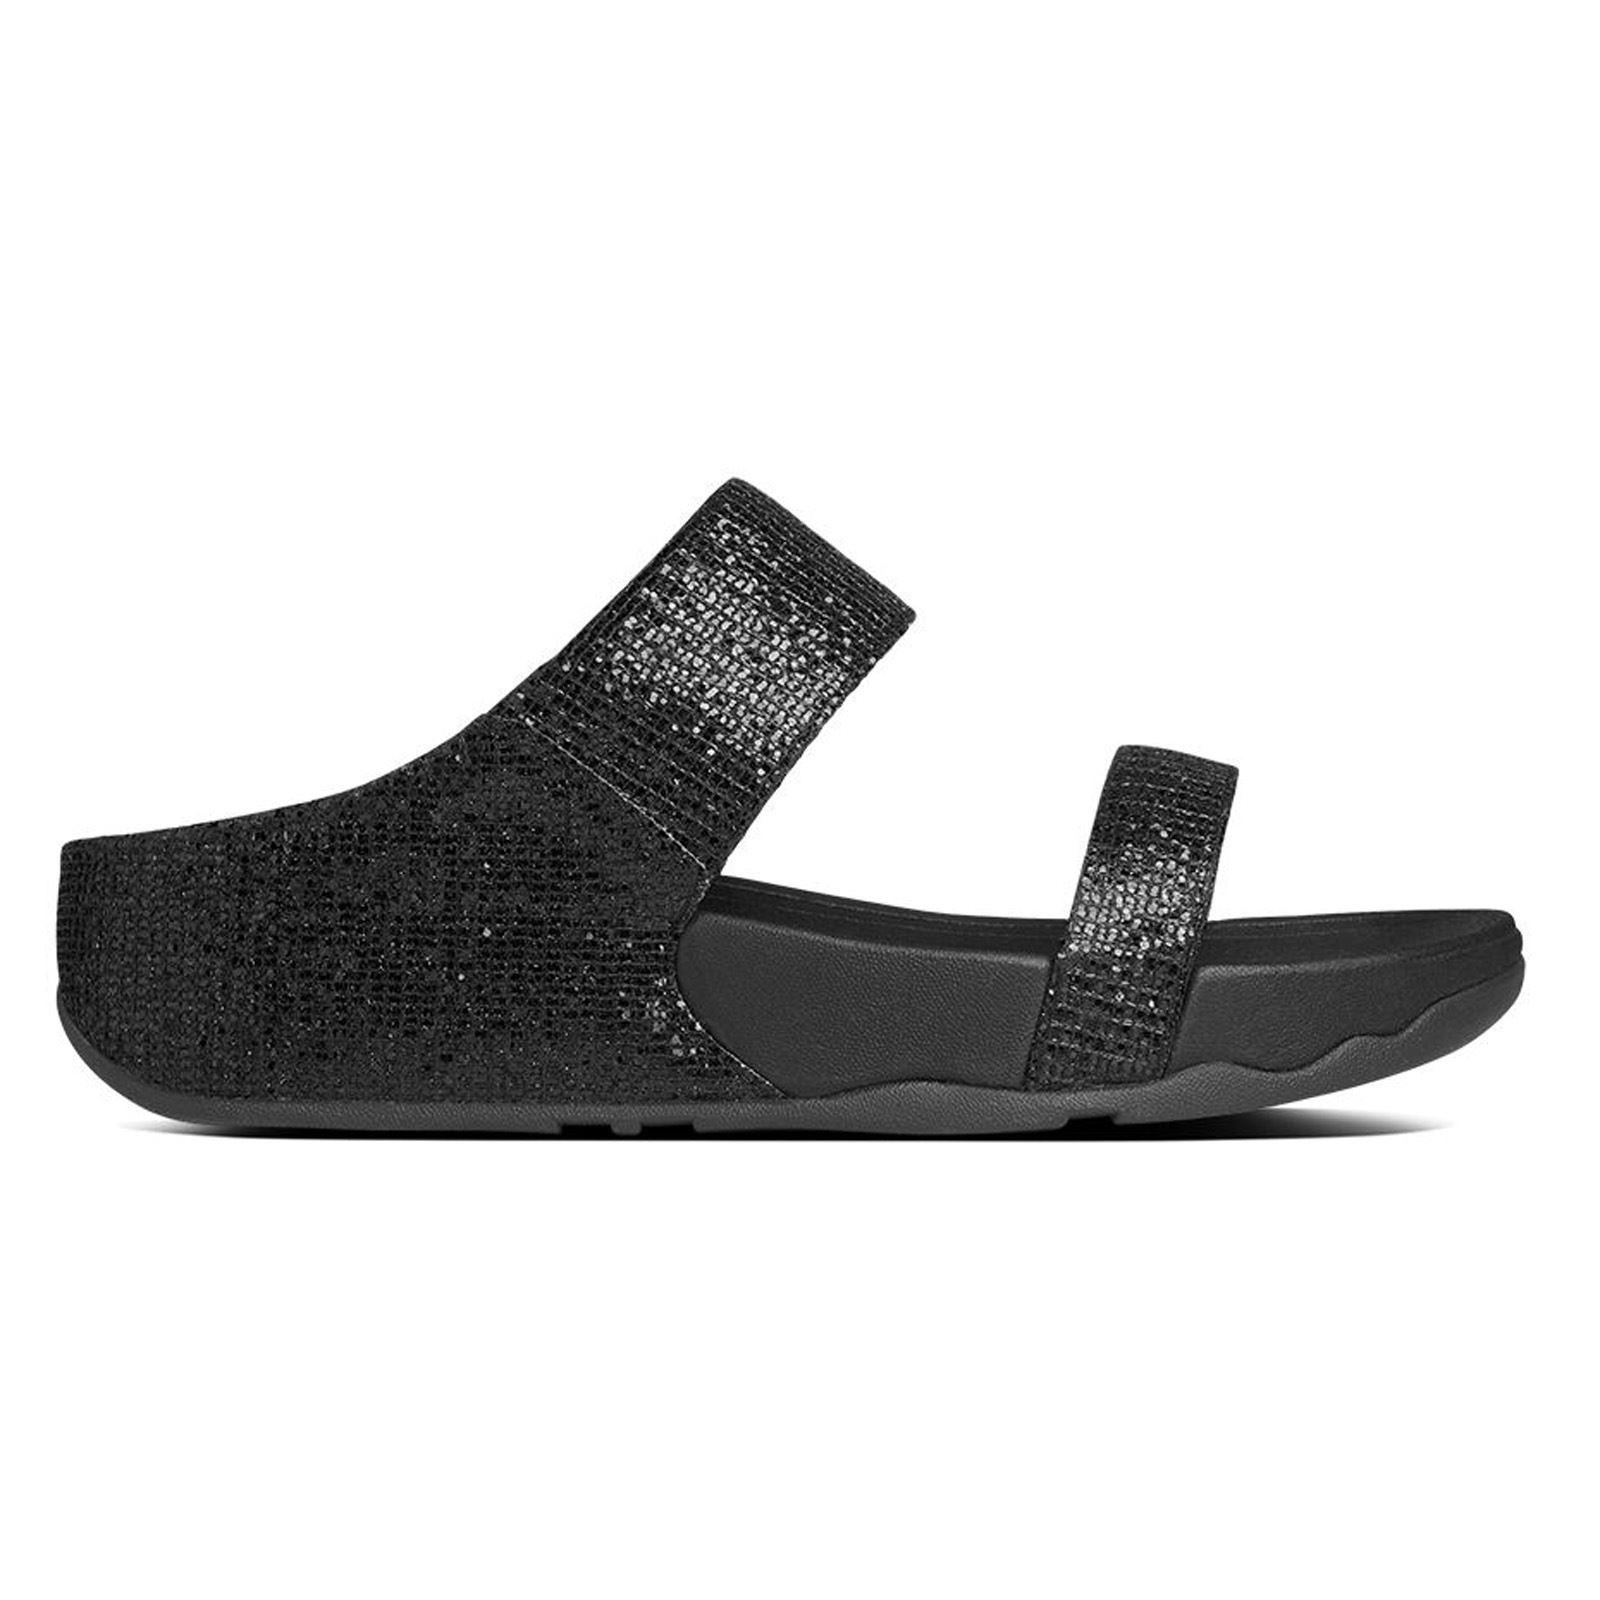 0dccd44c54e FitFlop Lulu Superglitz Slide Black Womens Sandals